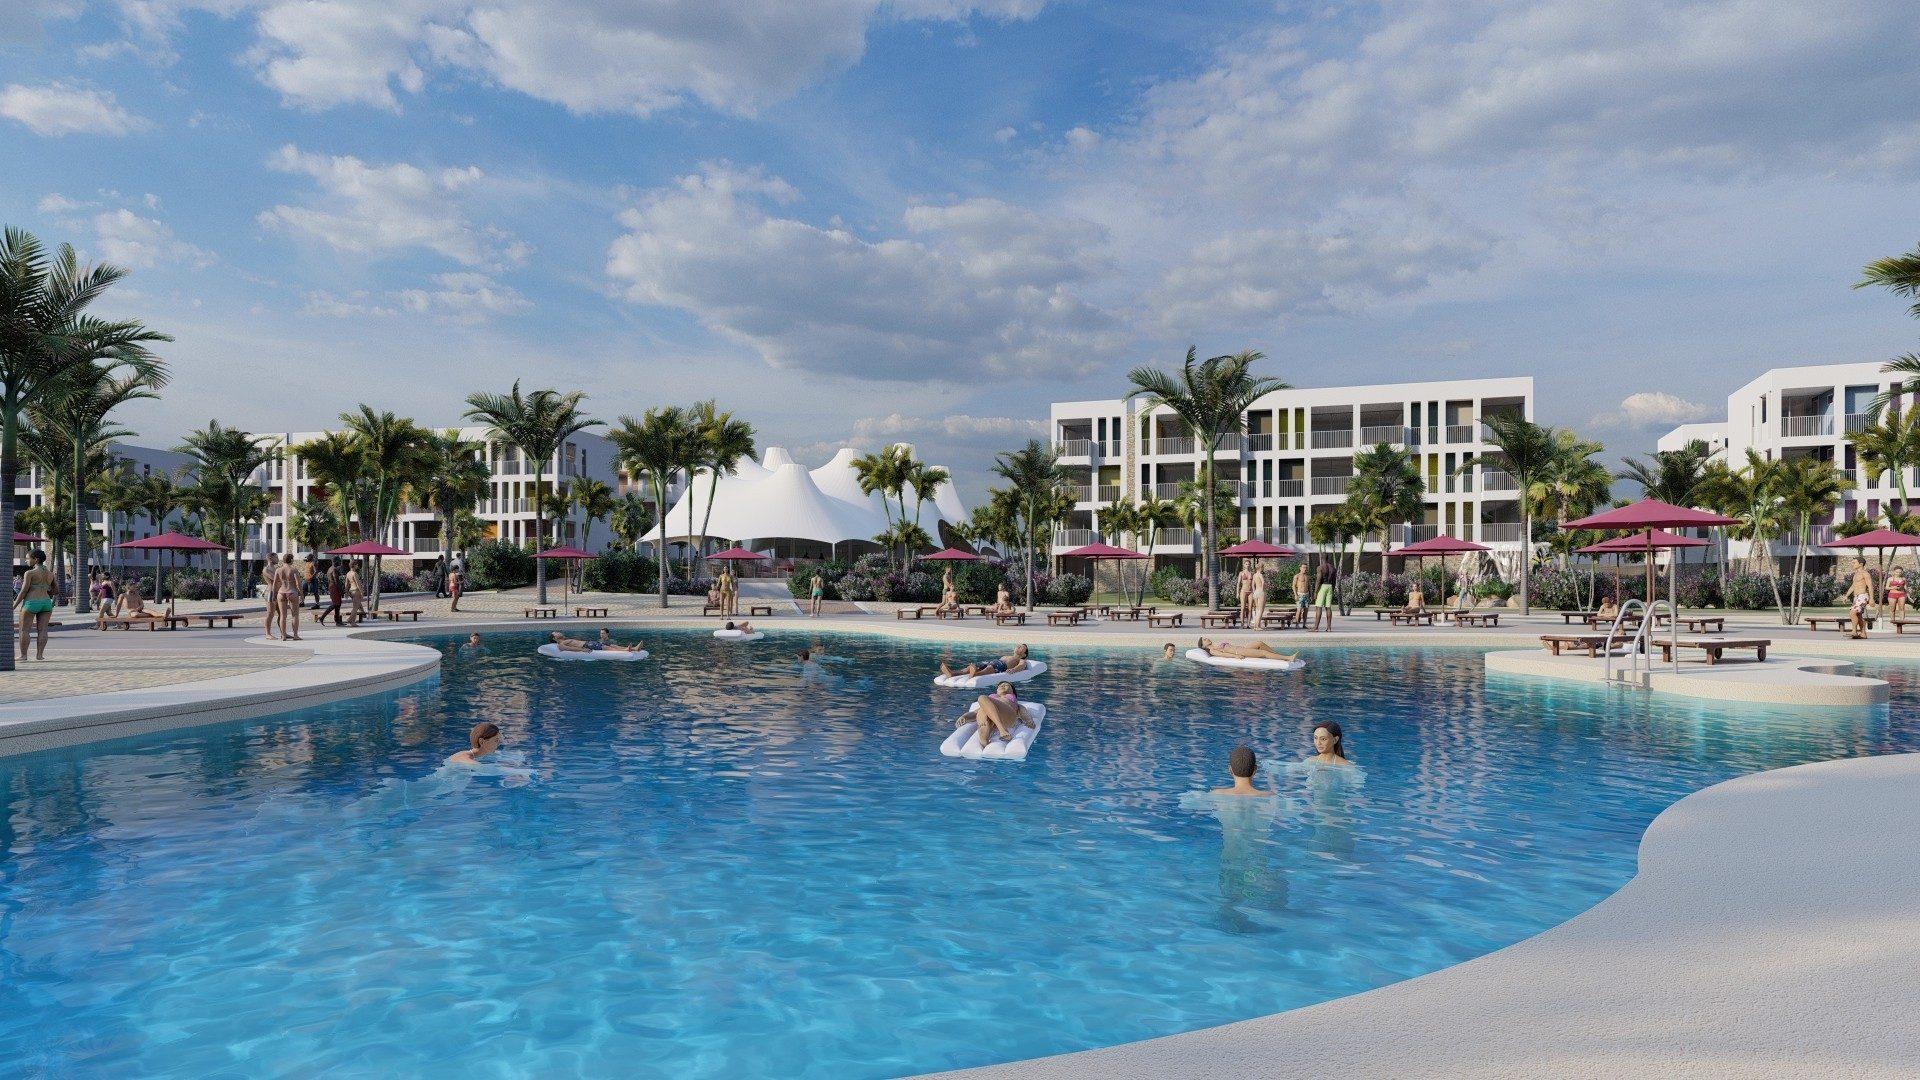 The Chogogo Bonaire dive and beach resort pool.